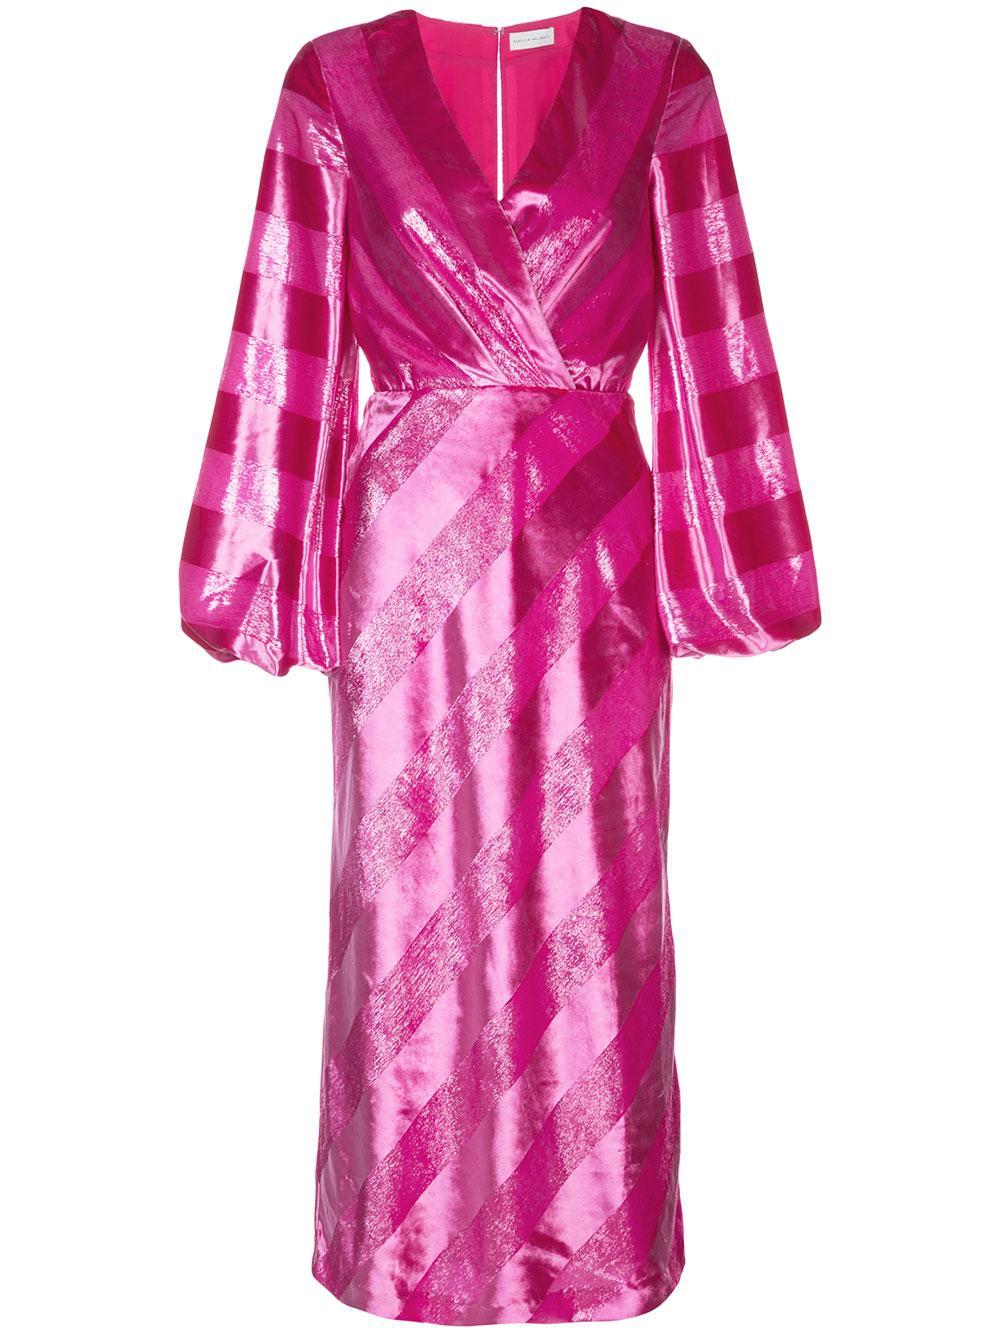 Maison Plunge Shadow Stripe Dress Item # 1904-1599